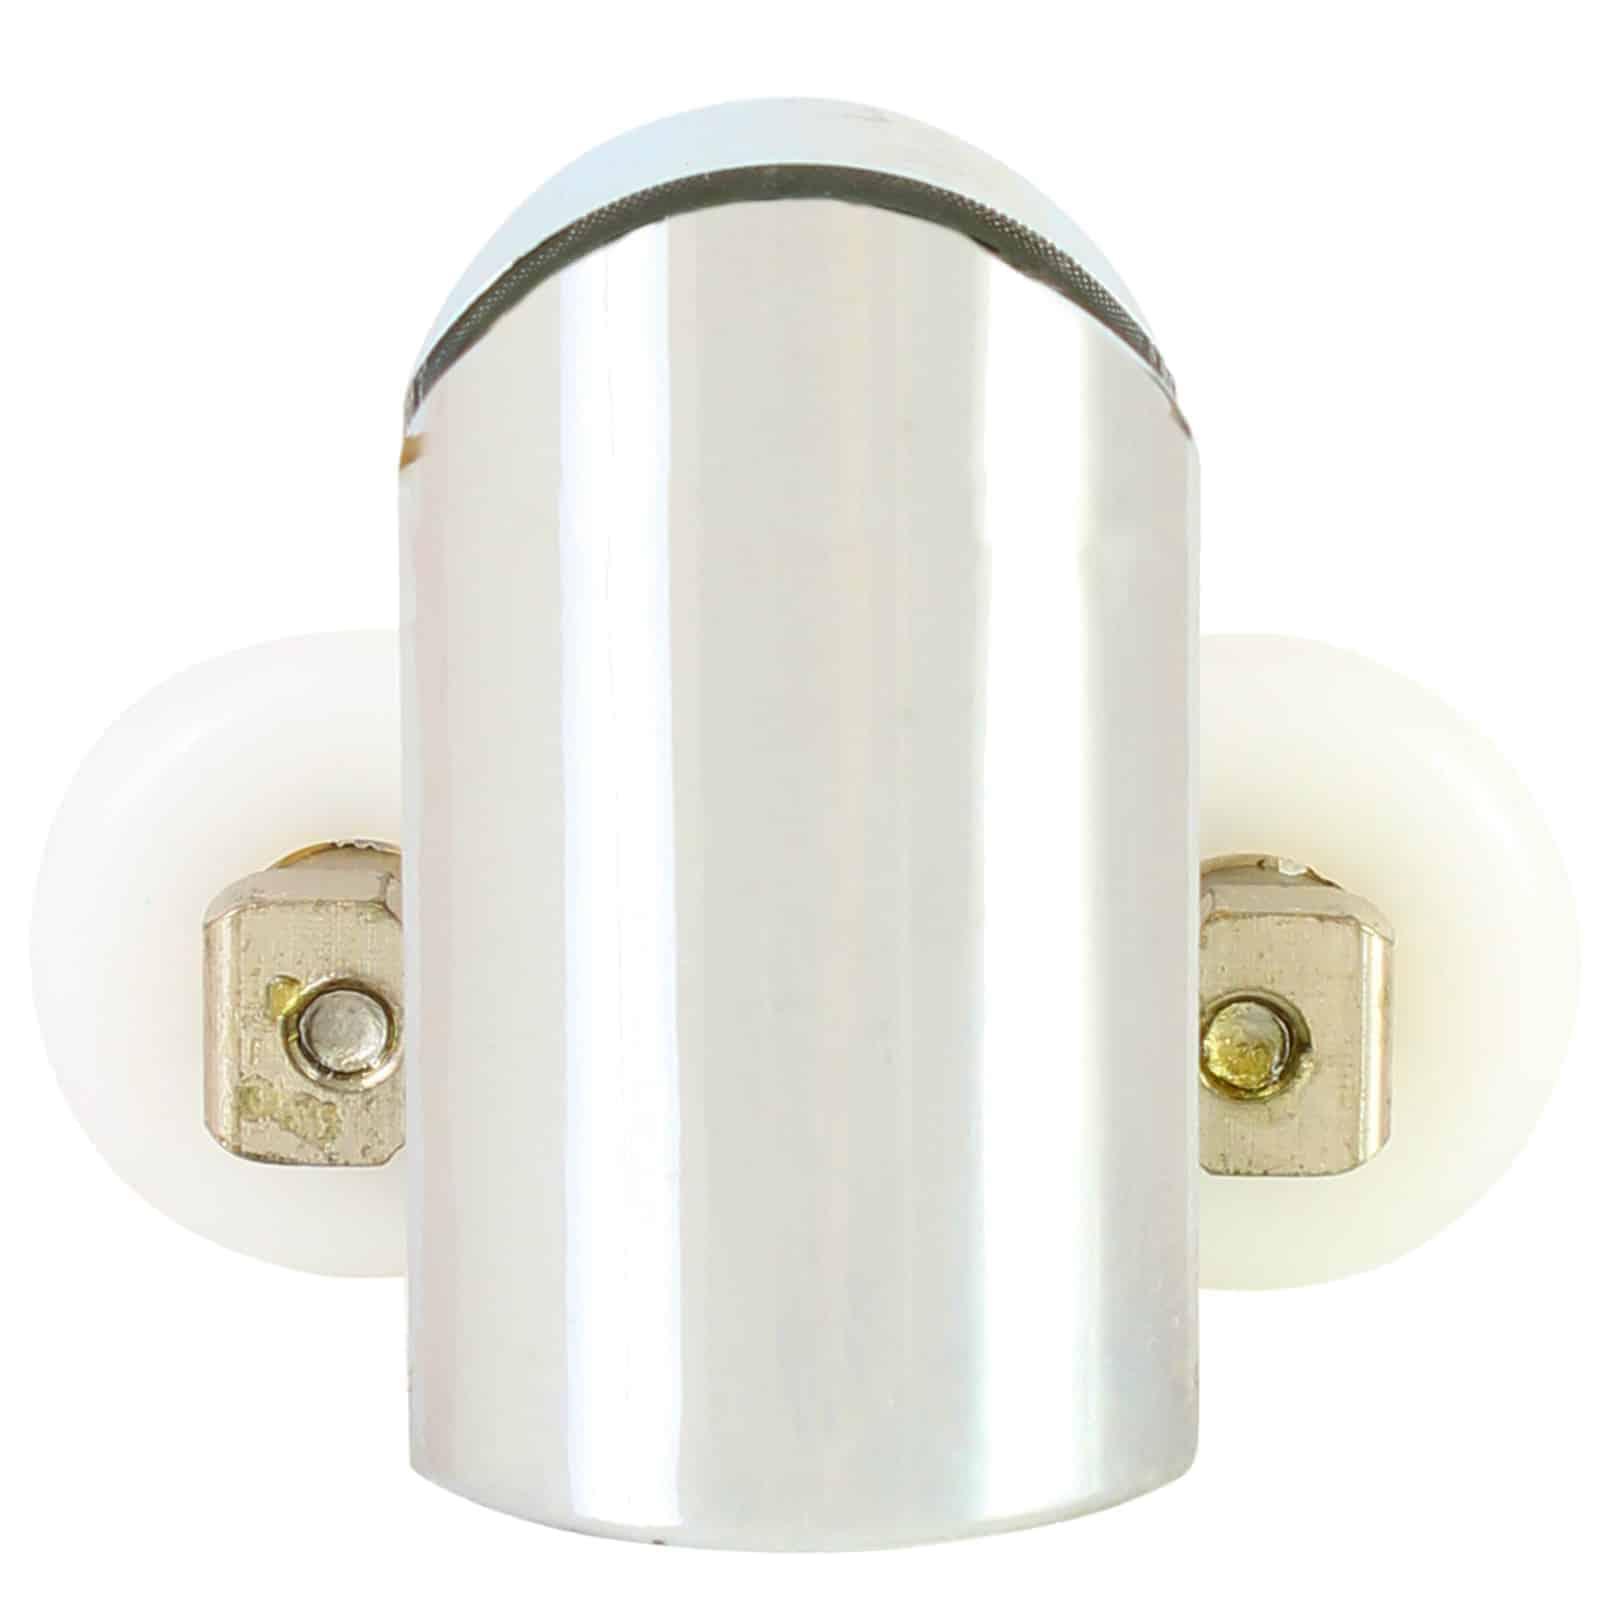 Shower Door Rollers Amp Wheels Model 061 Parts Amp Spares